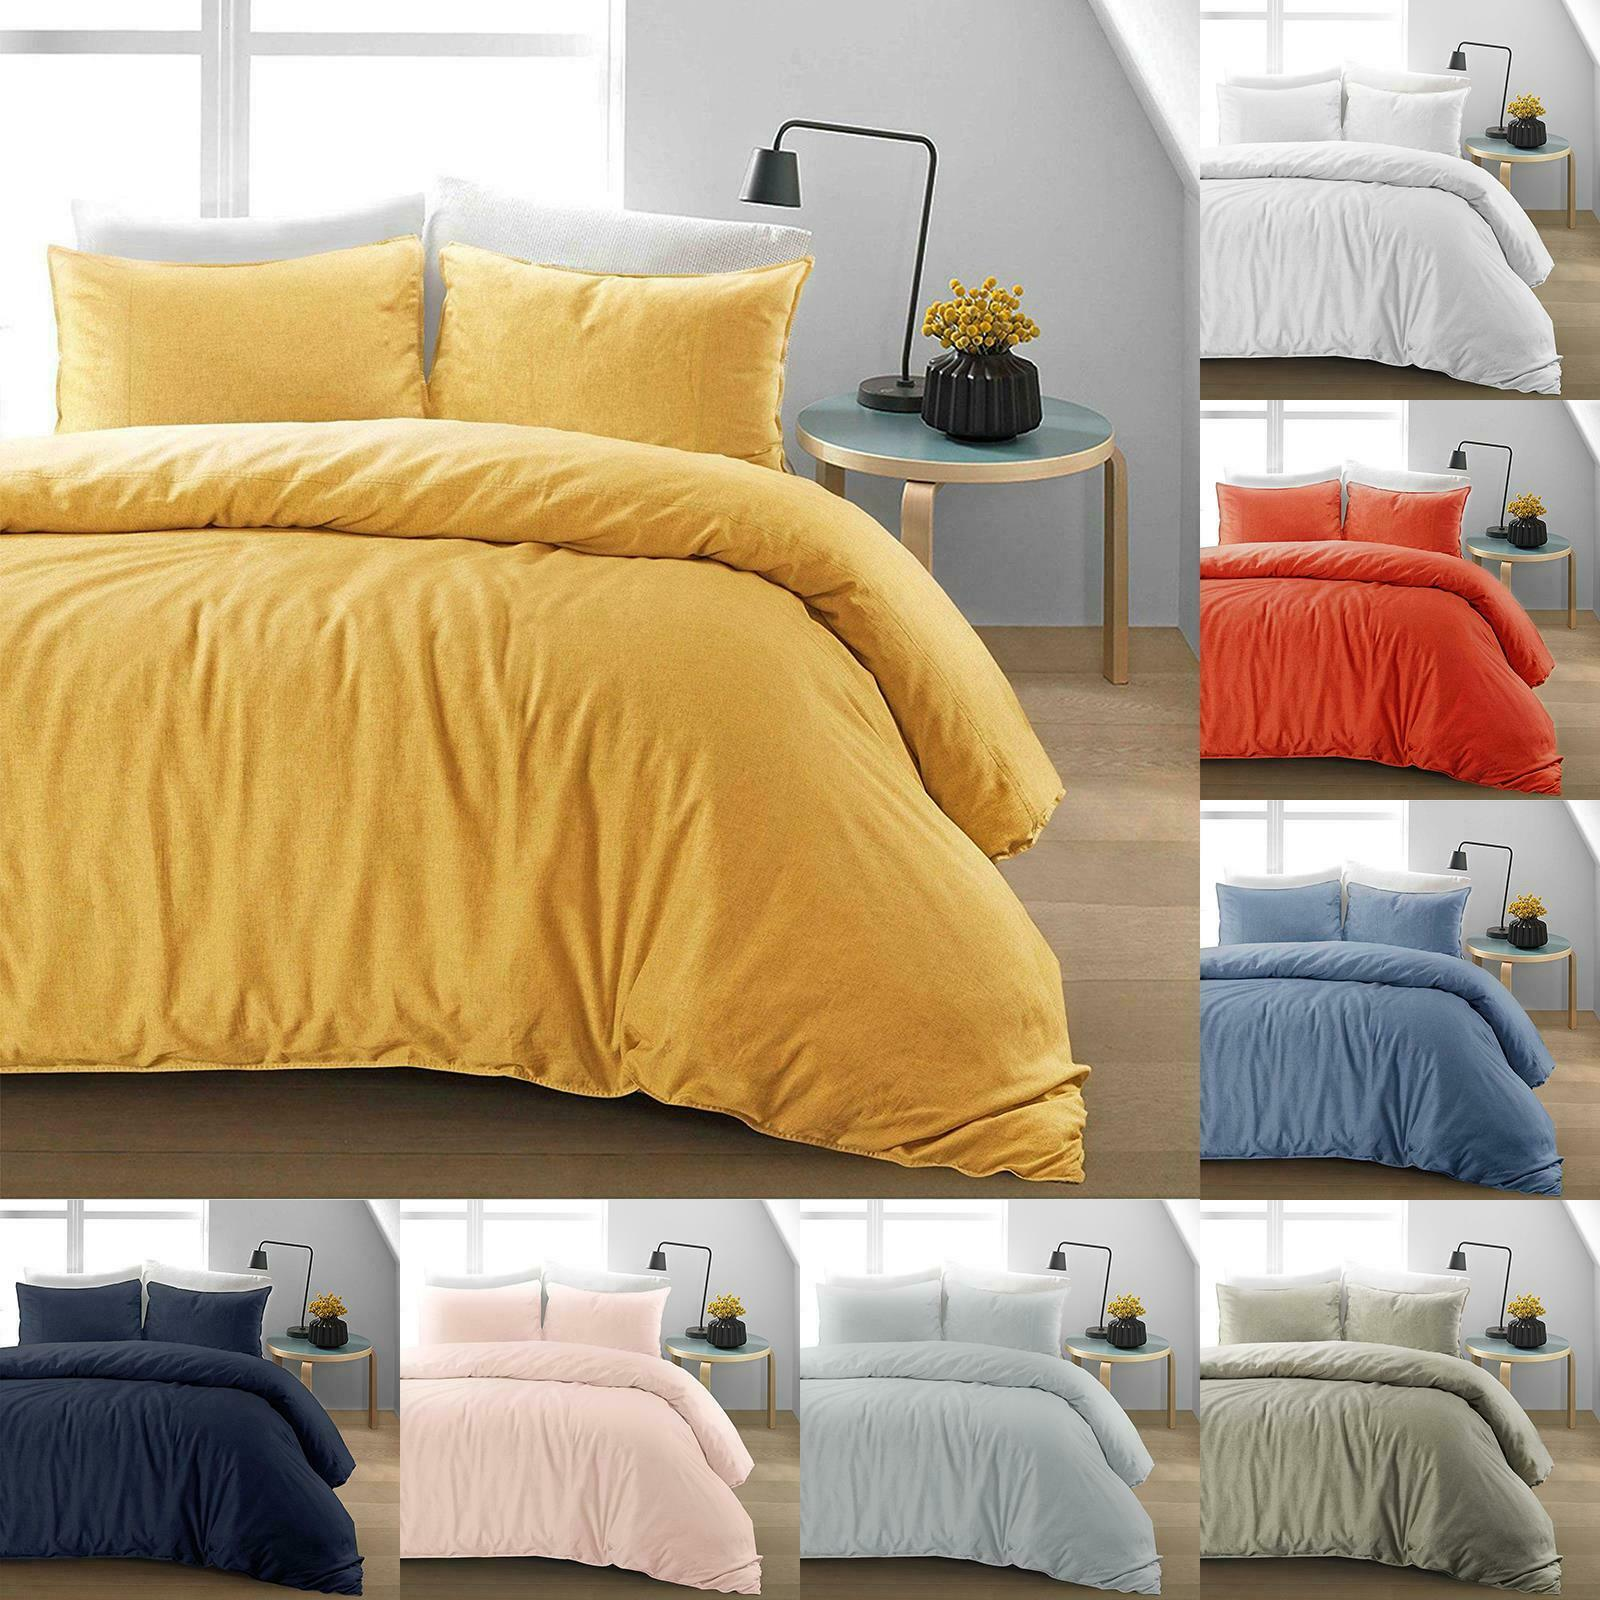 Luxury Natural 100 Linen Cotton Soft Quilt Duvet Cover Bedding Bed Linen Set Ebay